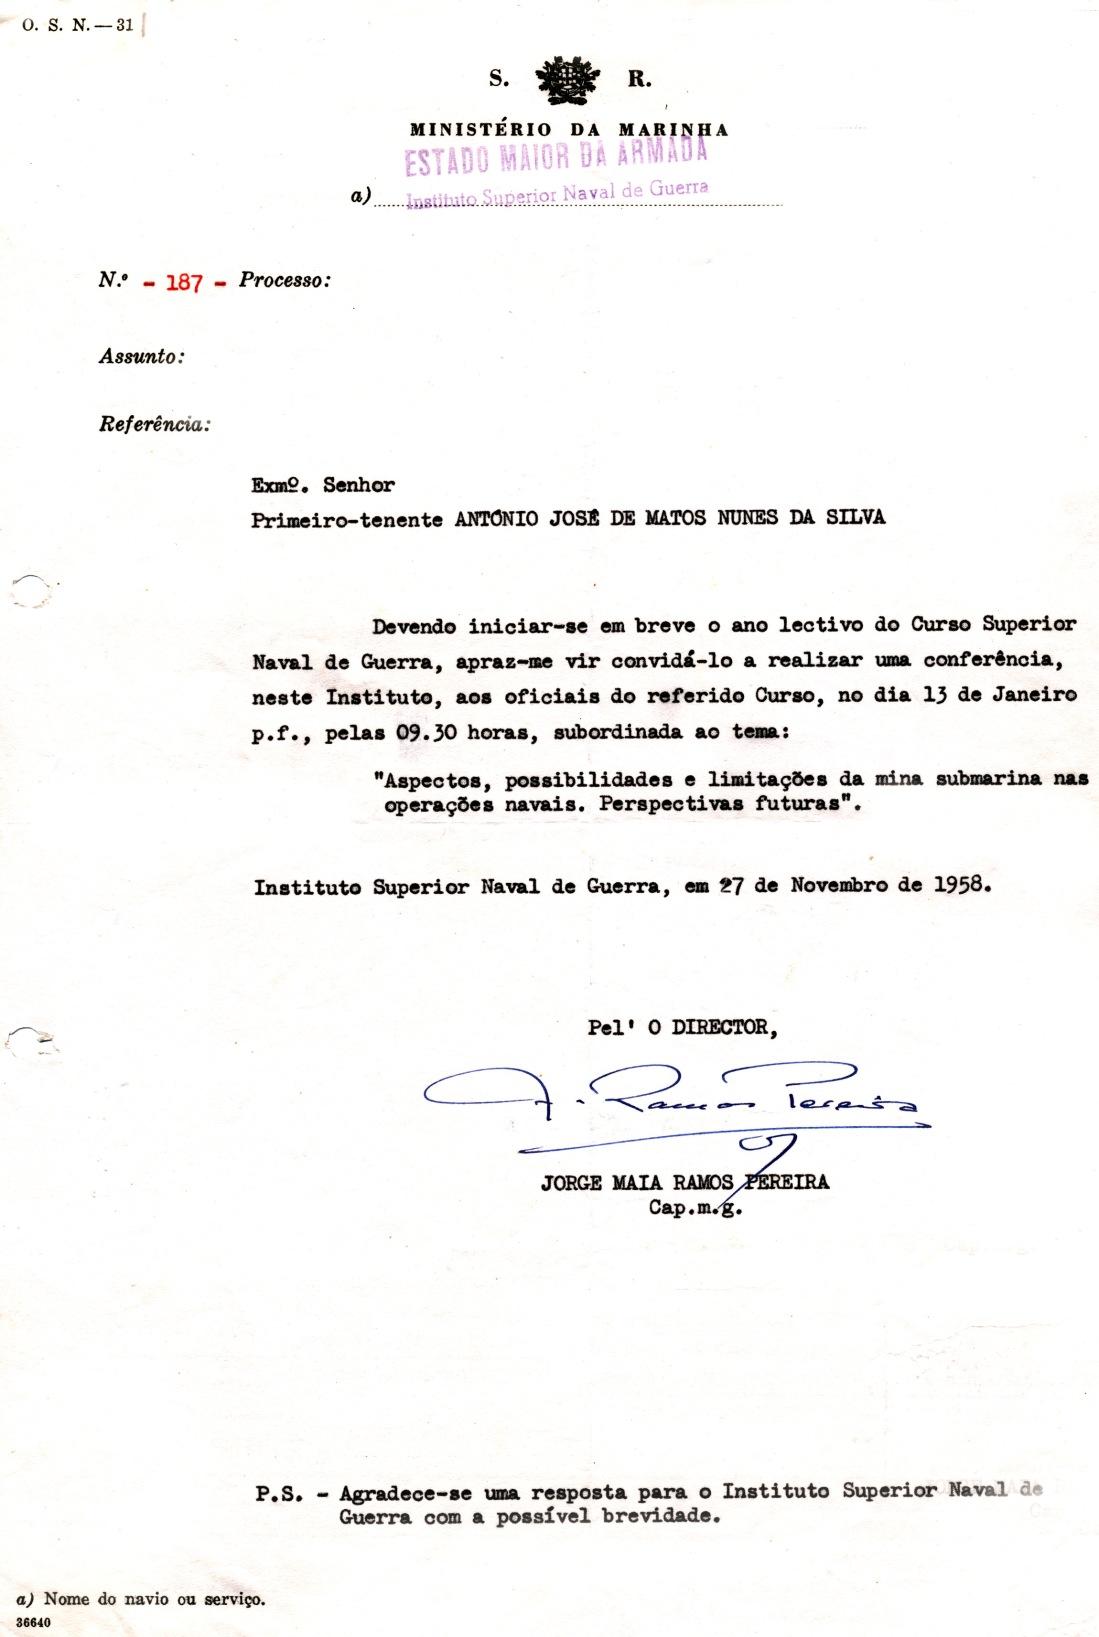 00383 959-01-13 Fiz conferência sobre minas ao Curso Superior Naval de Guerra por convite do Director do Instituto